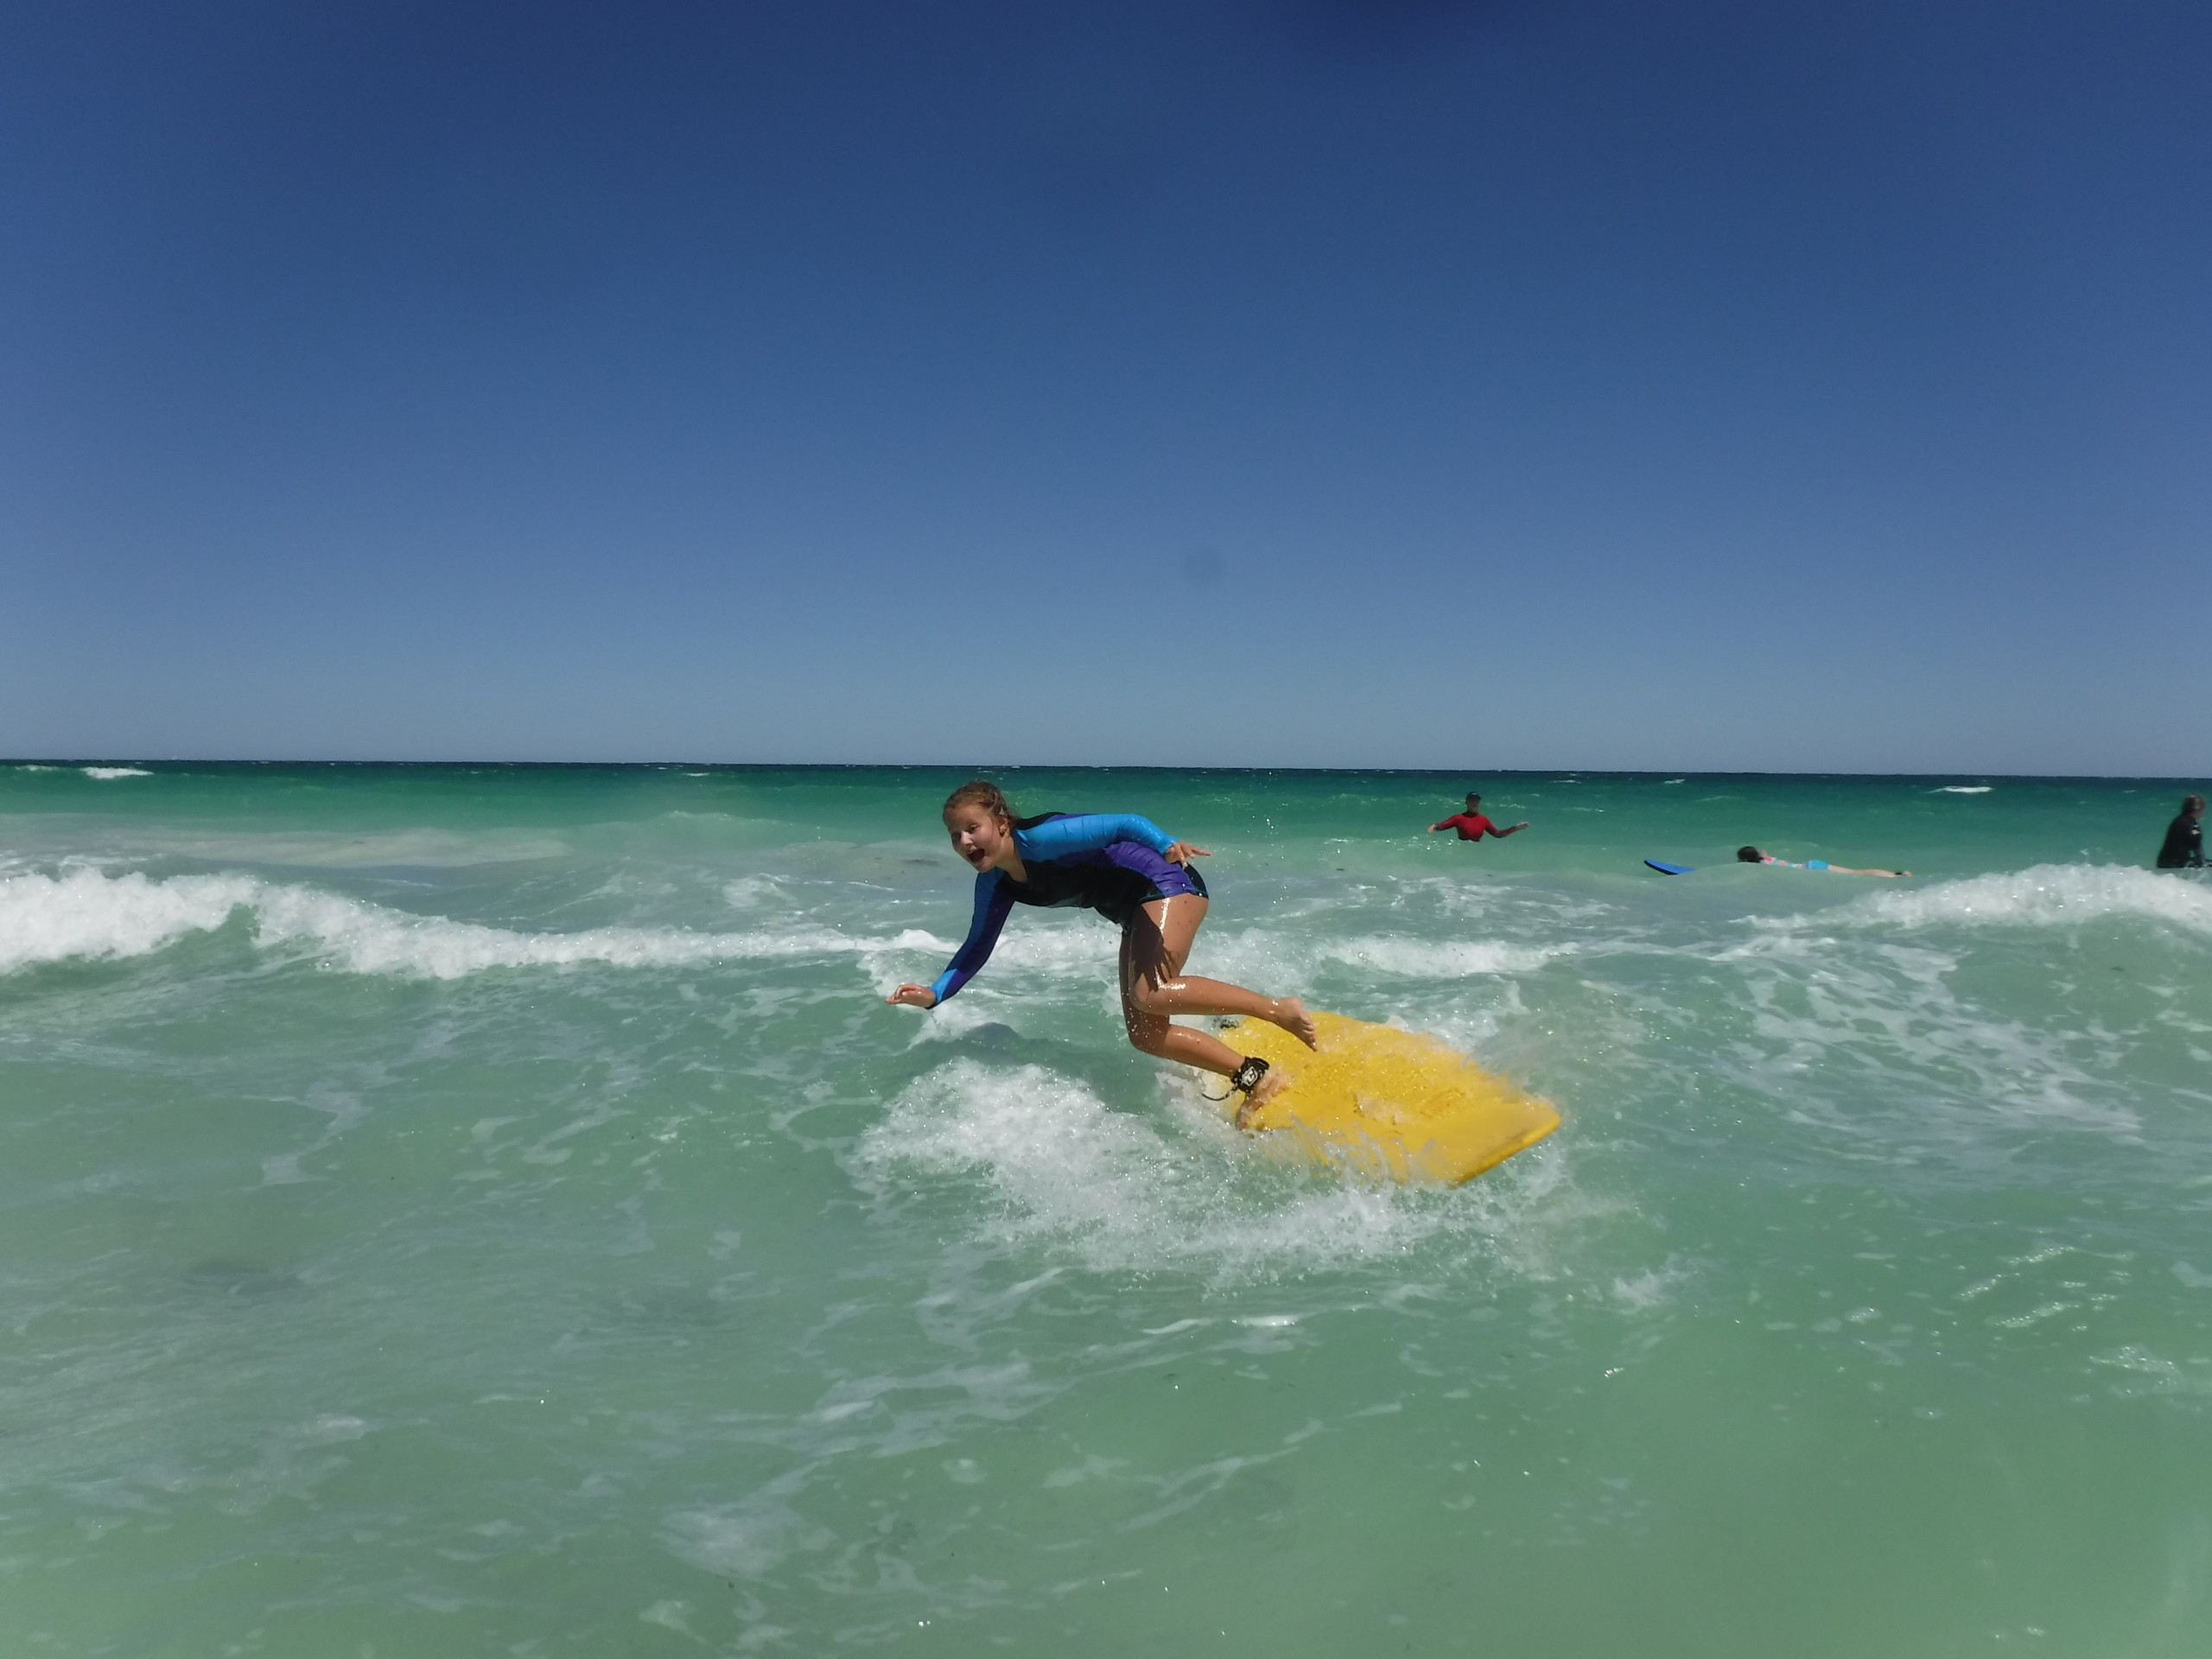 Surfing in Western Australia: Lancelin